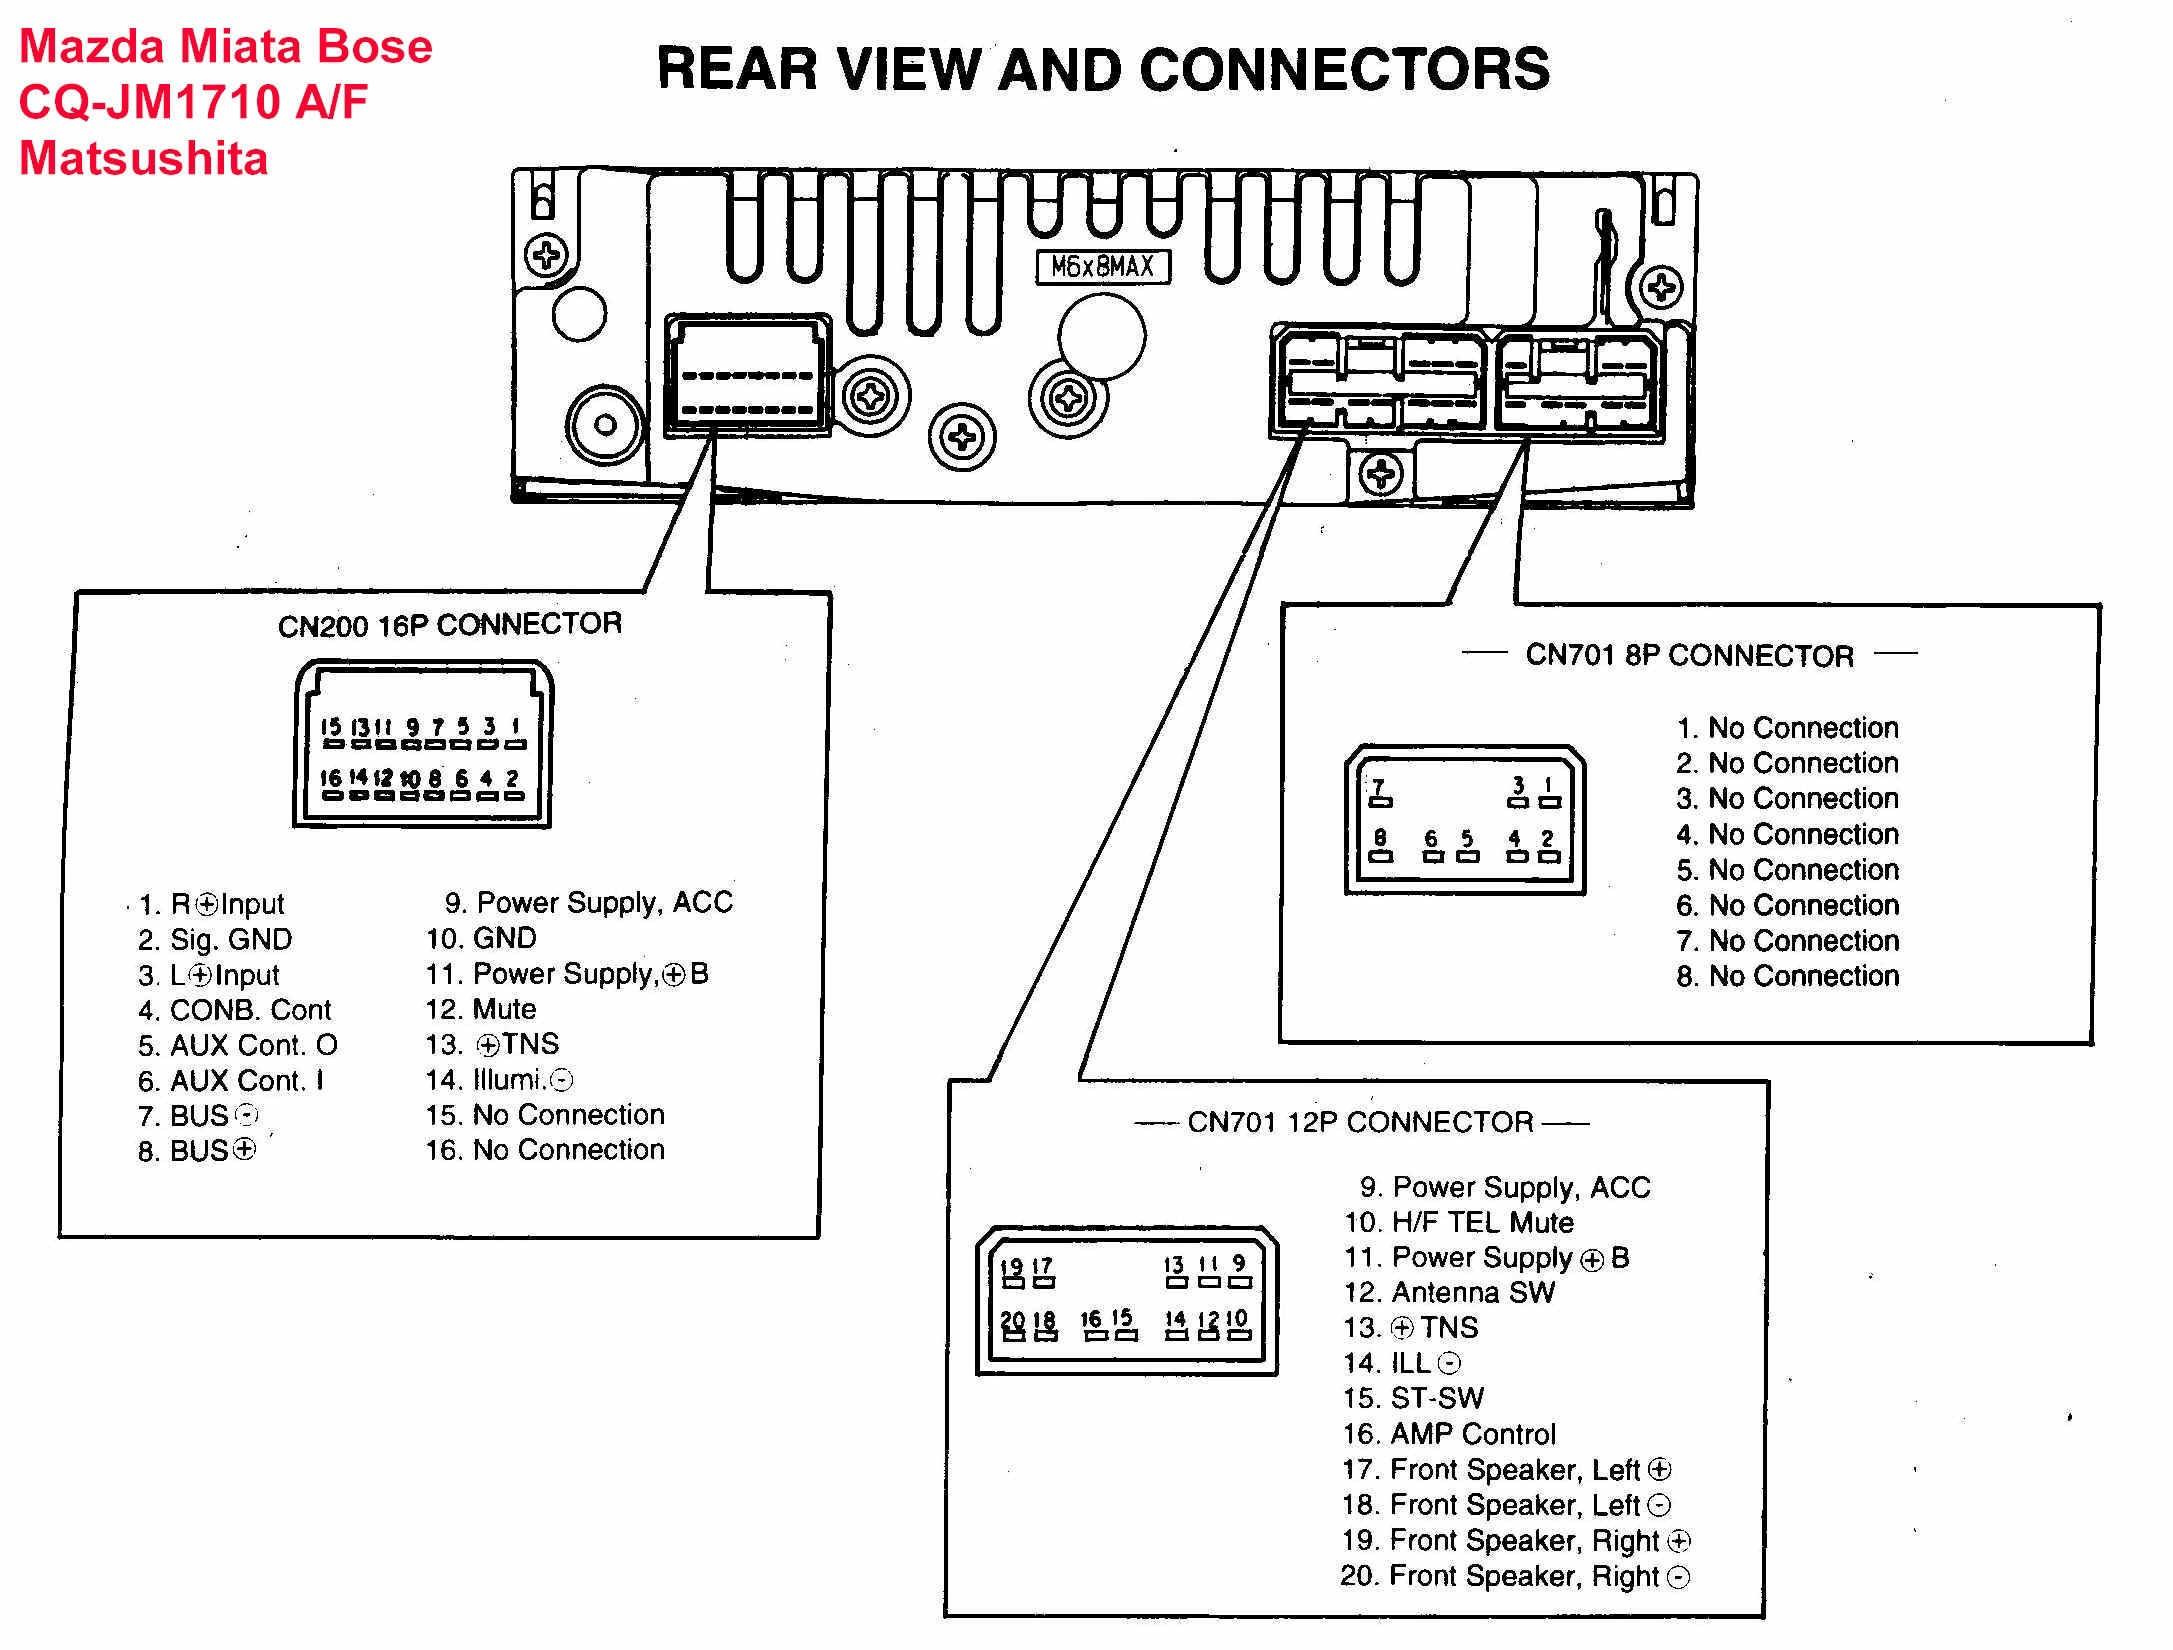 wiring diagram sony xplod 52wx4 volvo xc90 car stereo